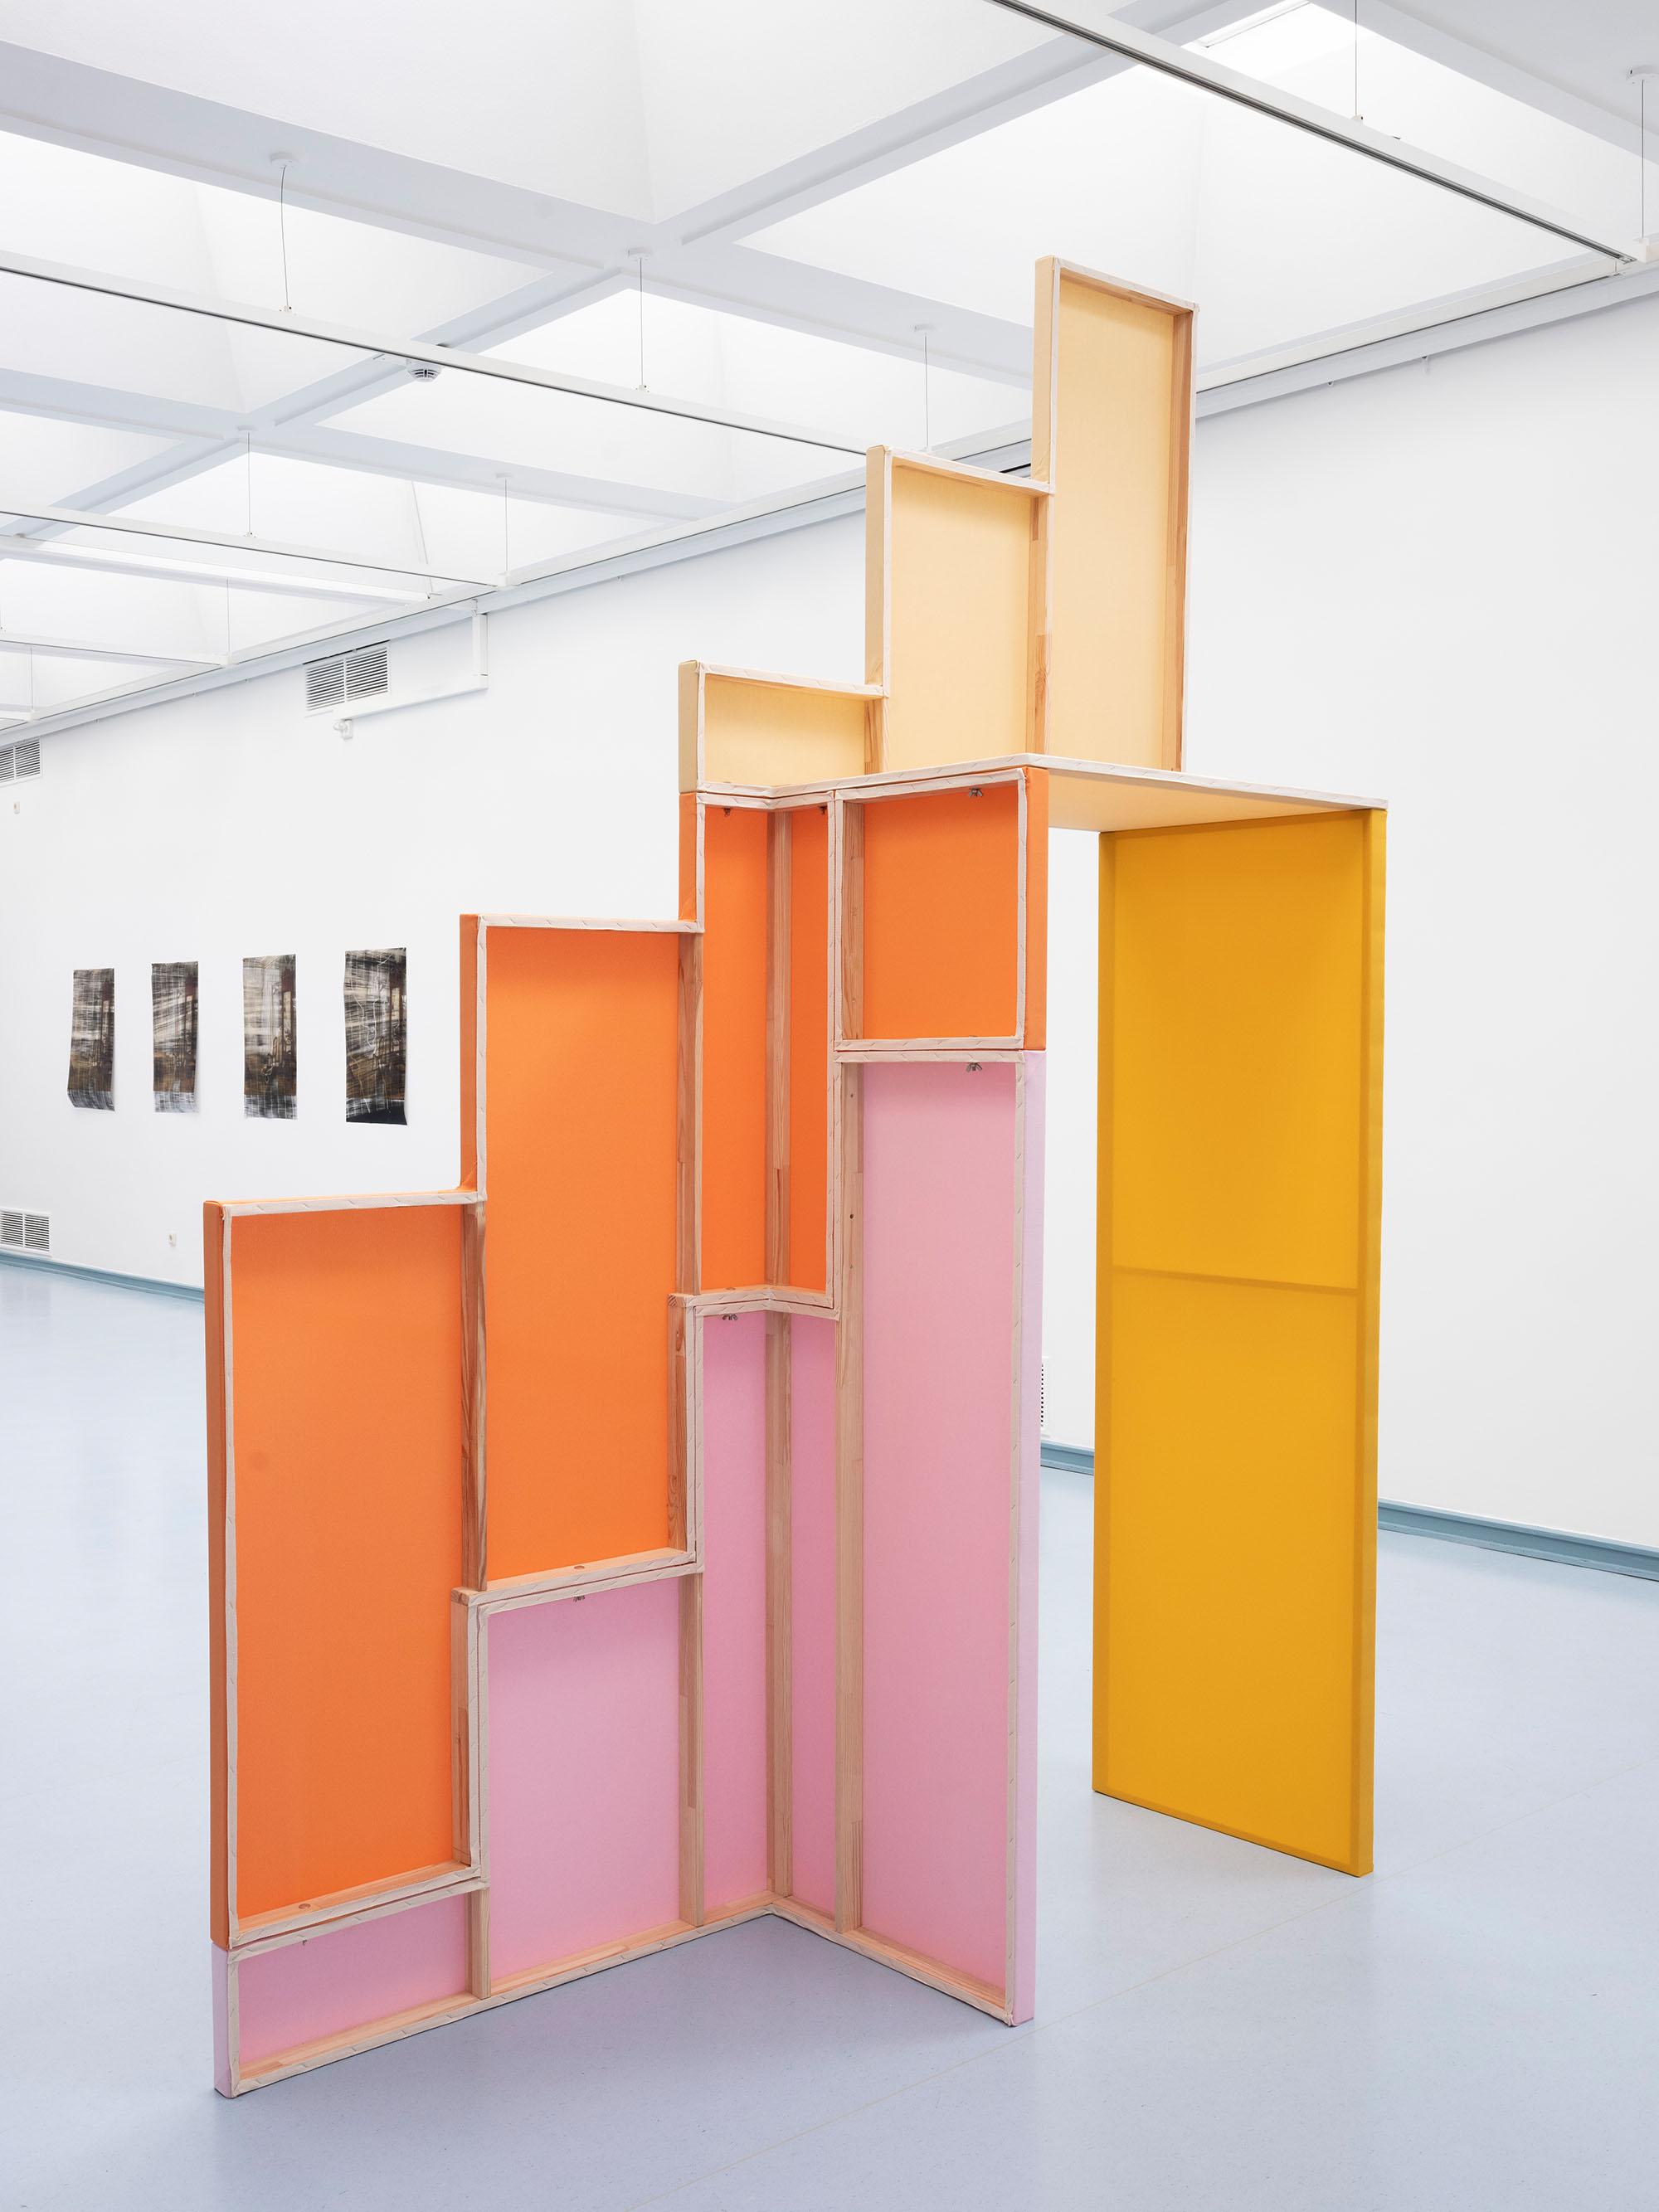 international, installation, sculpture, original,